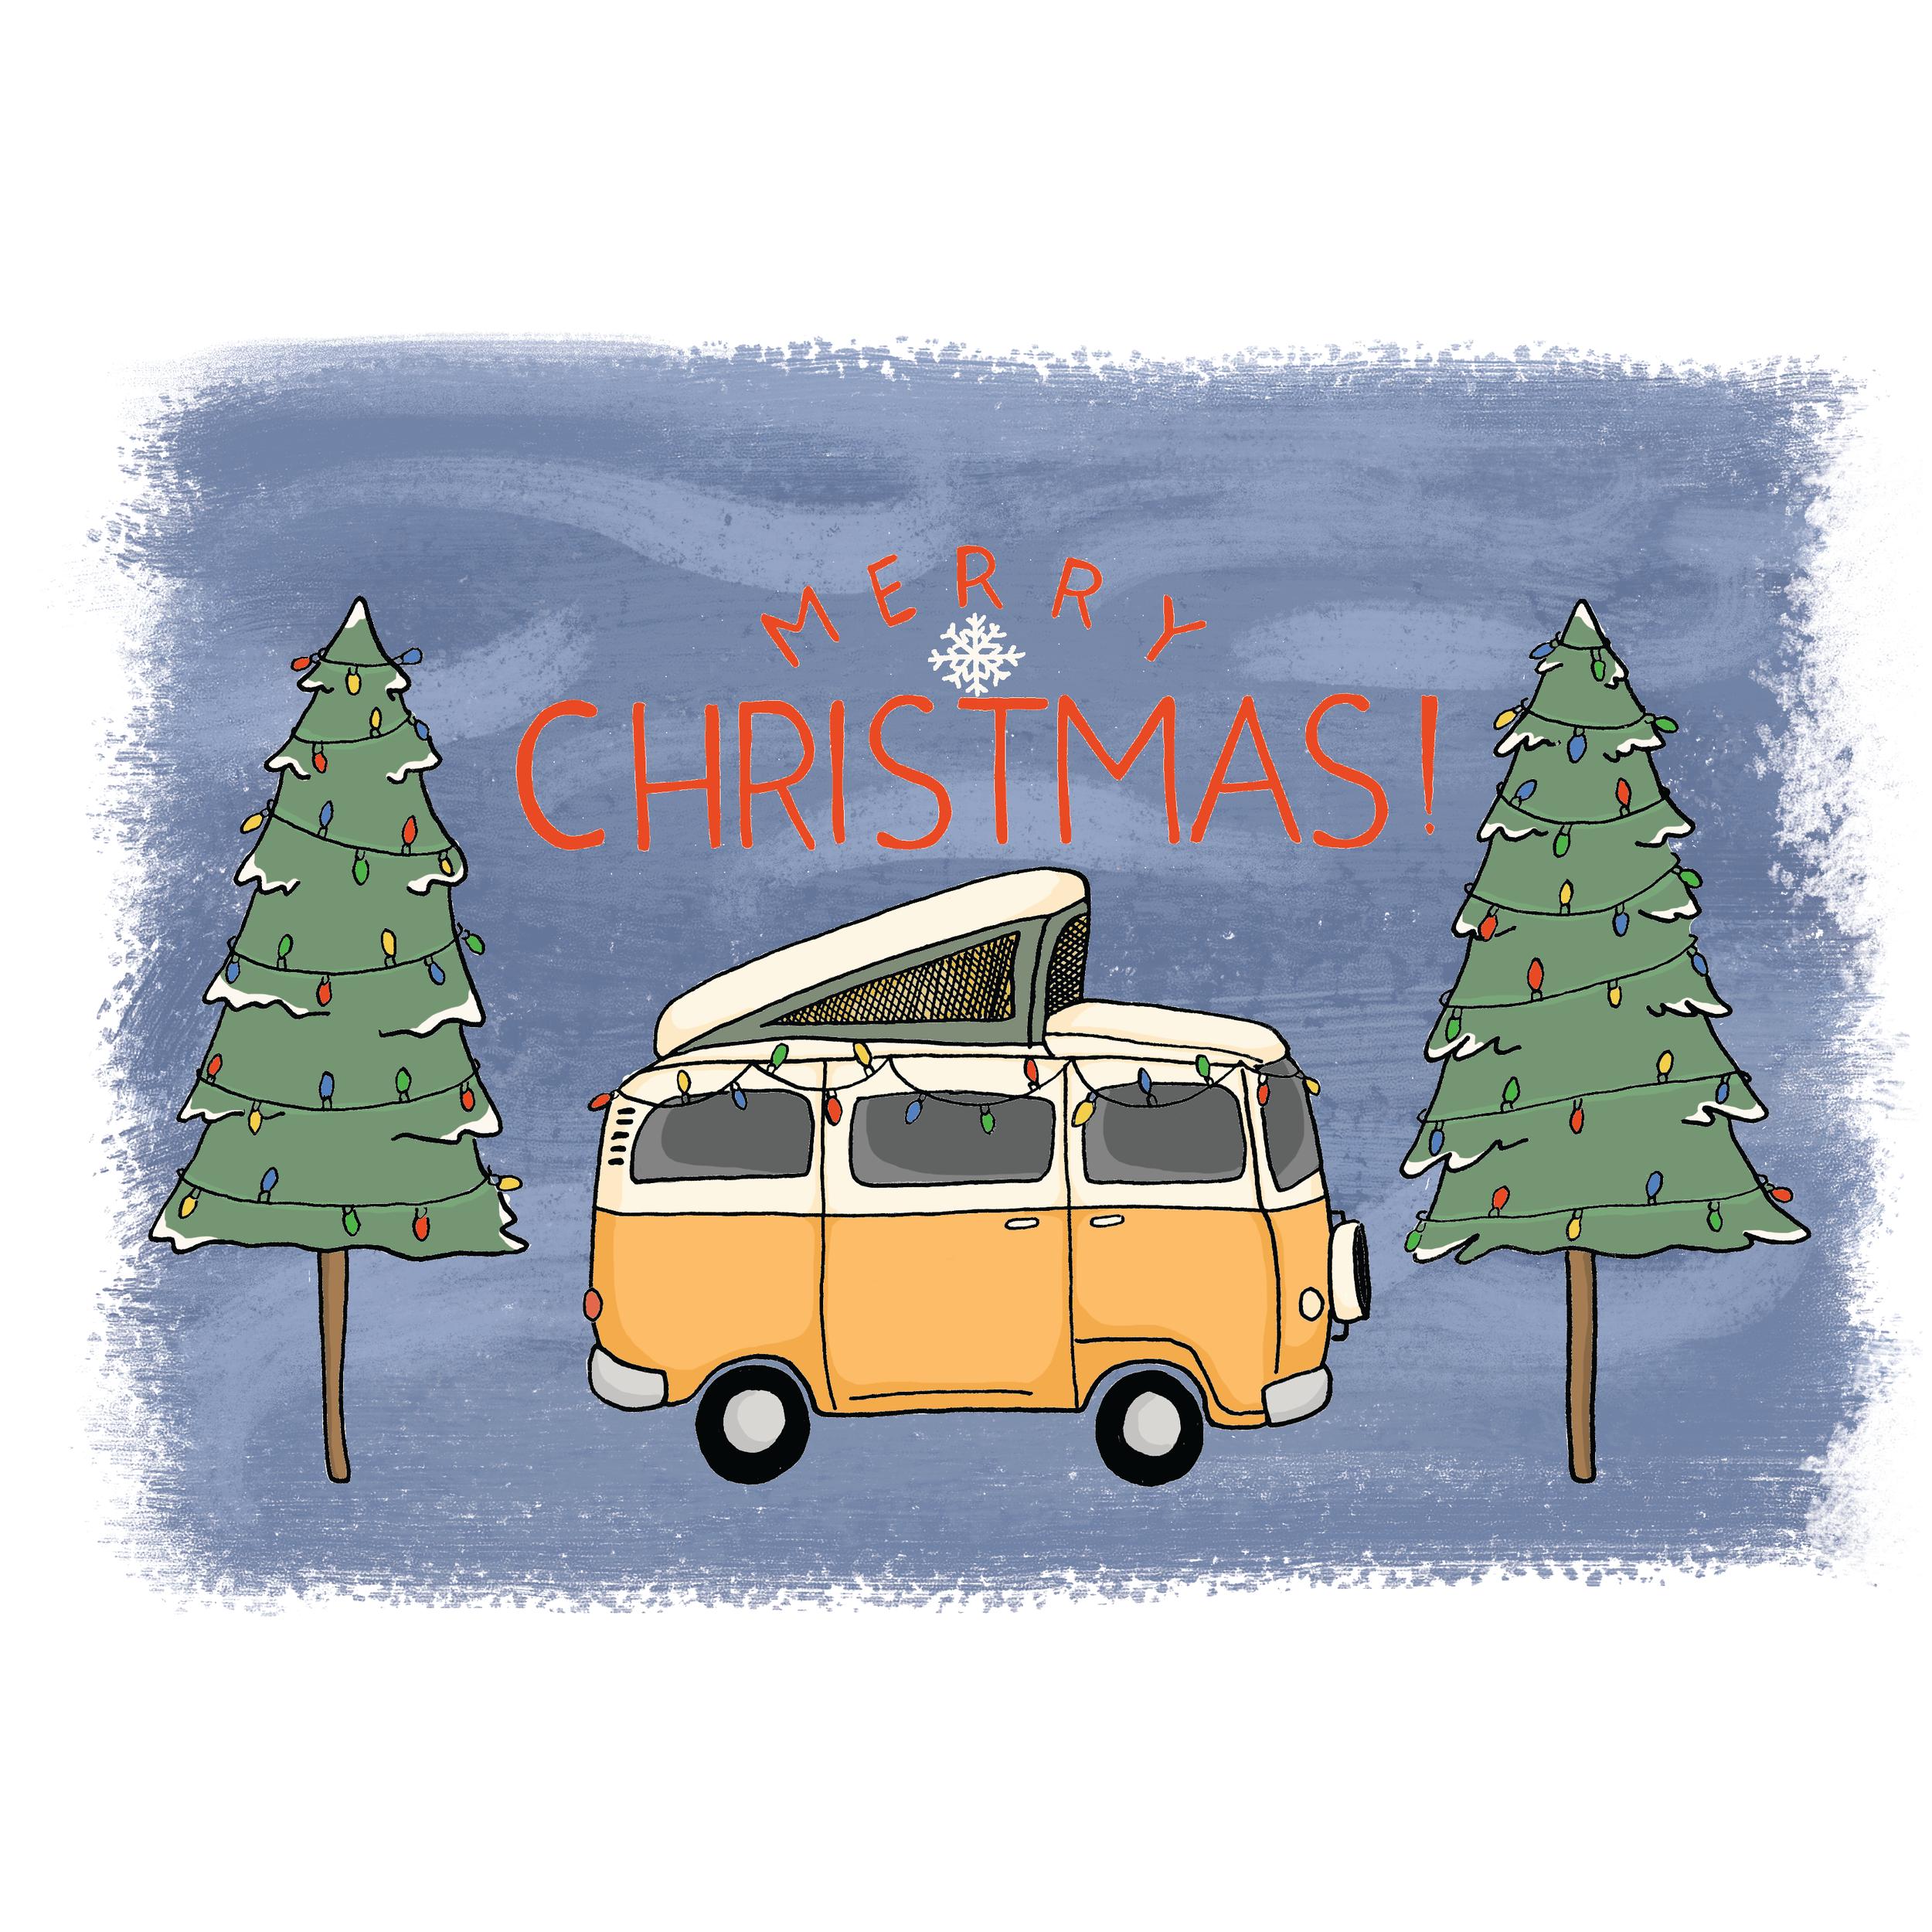 christmasvan-01.png